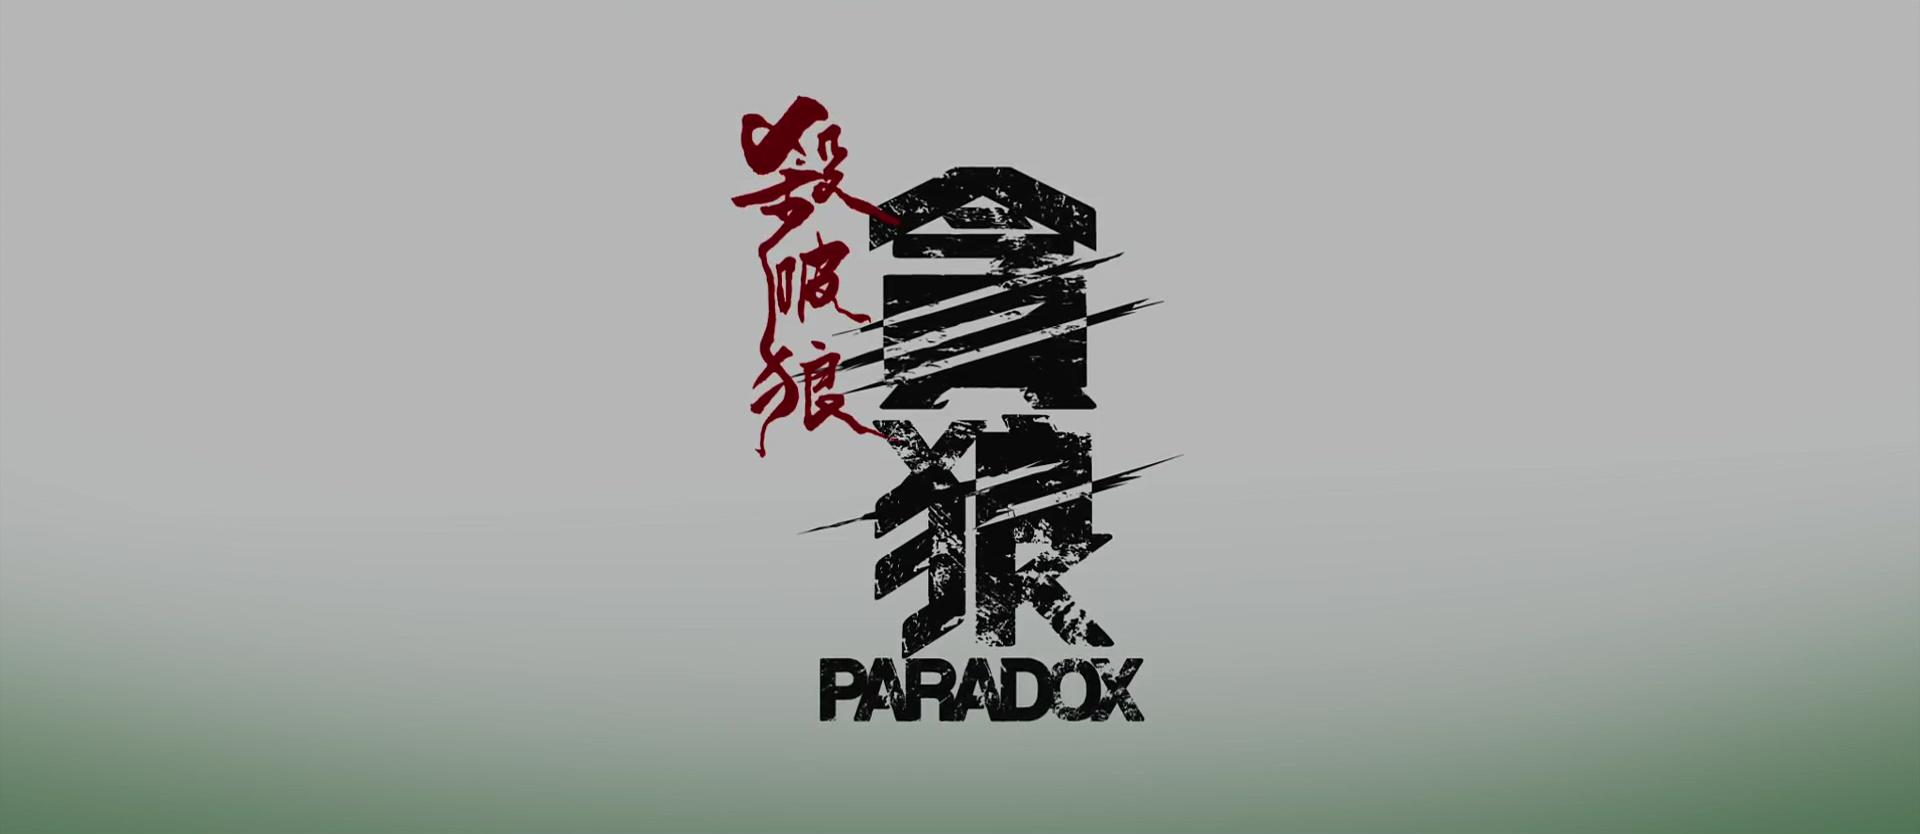 PARADOX (殺破狼・貪狼) de Wilson Yip (2017)